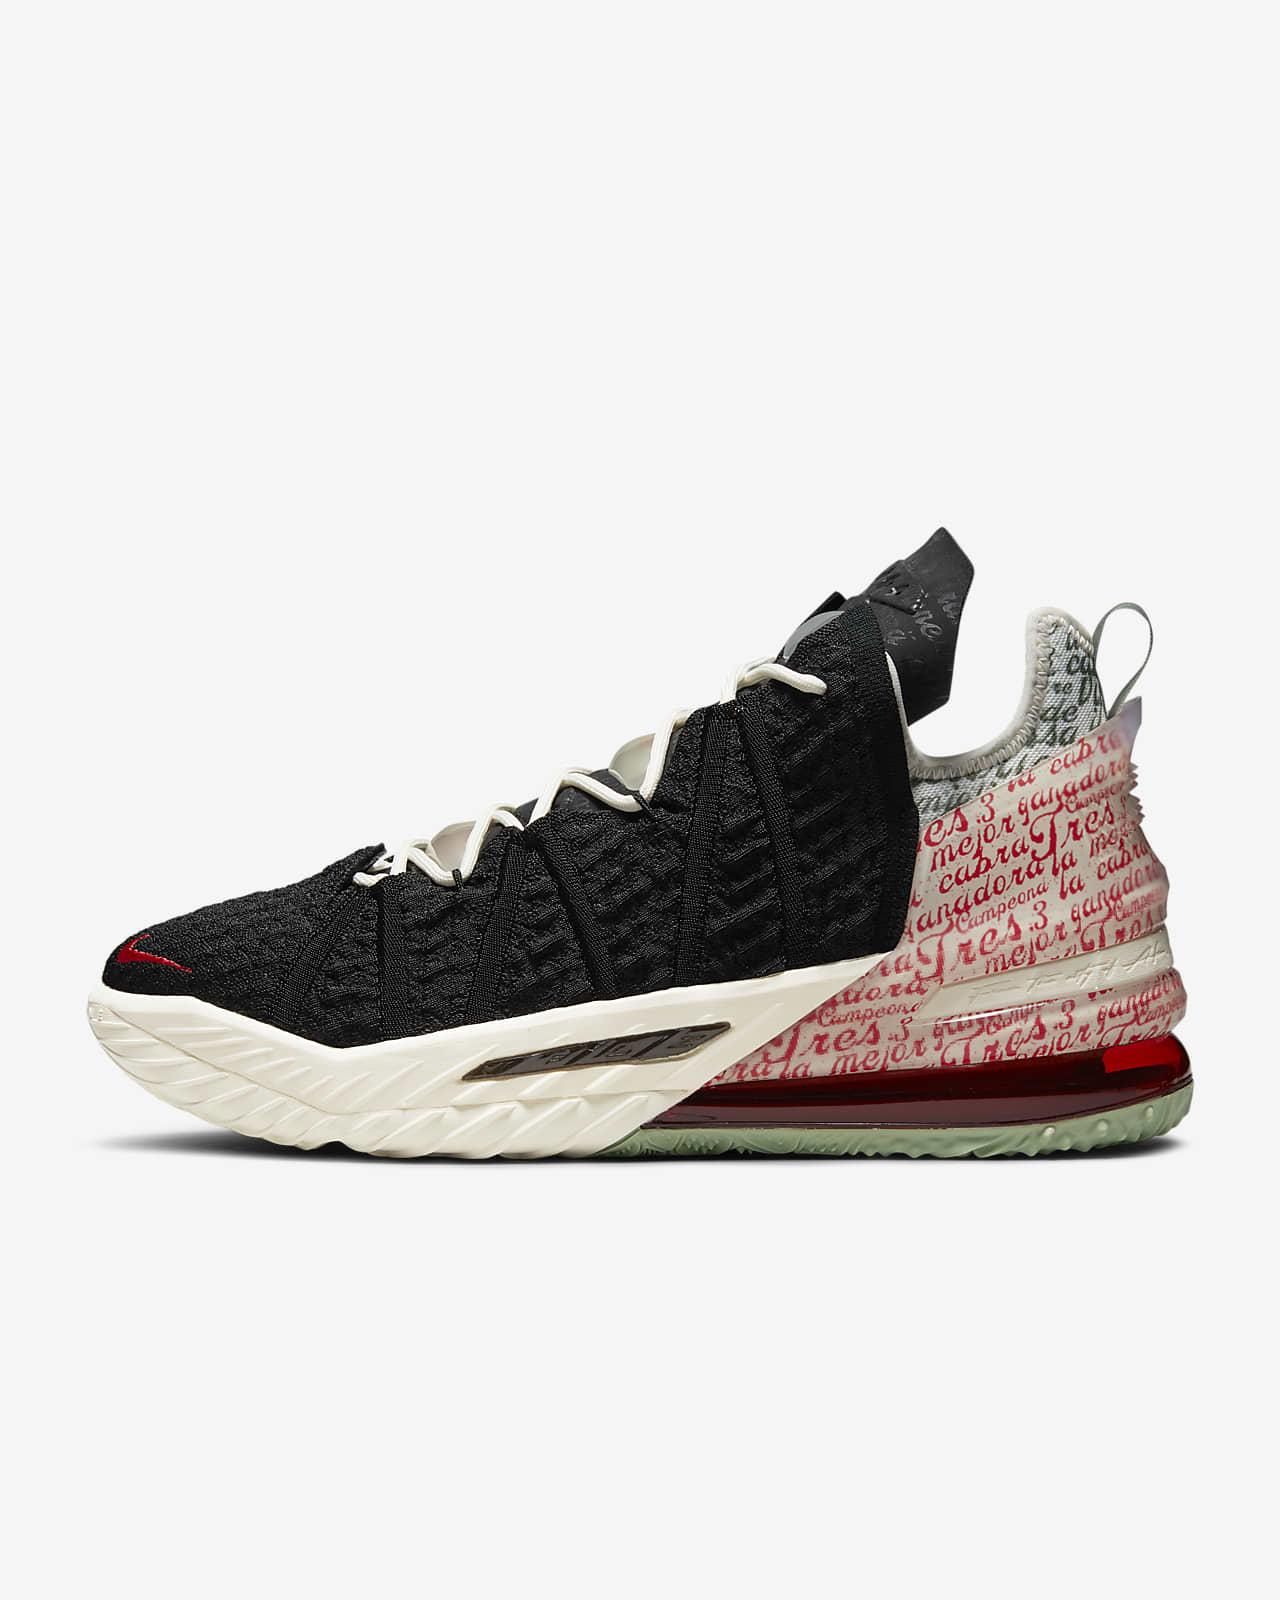 Chaussure de basketball LeBron 18